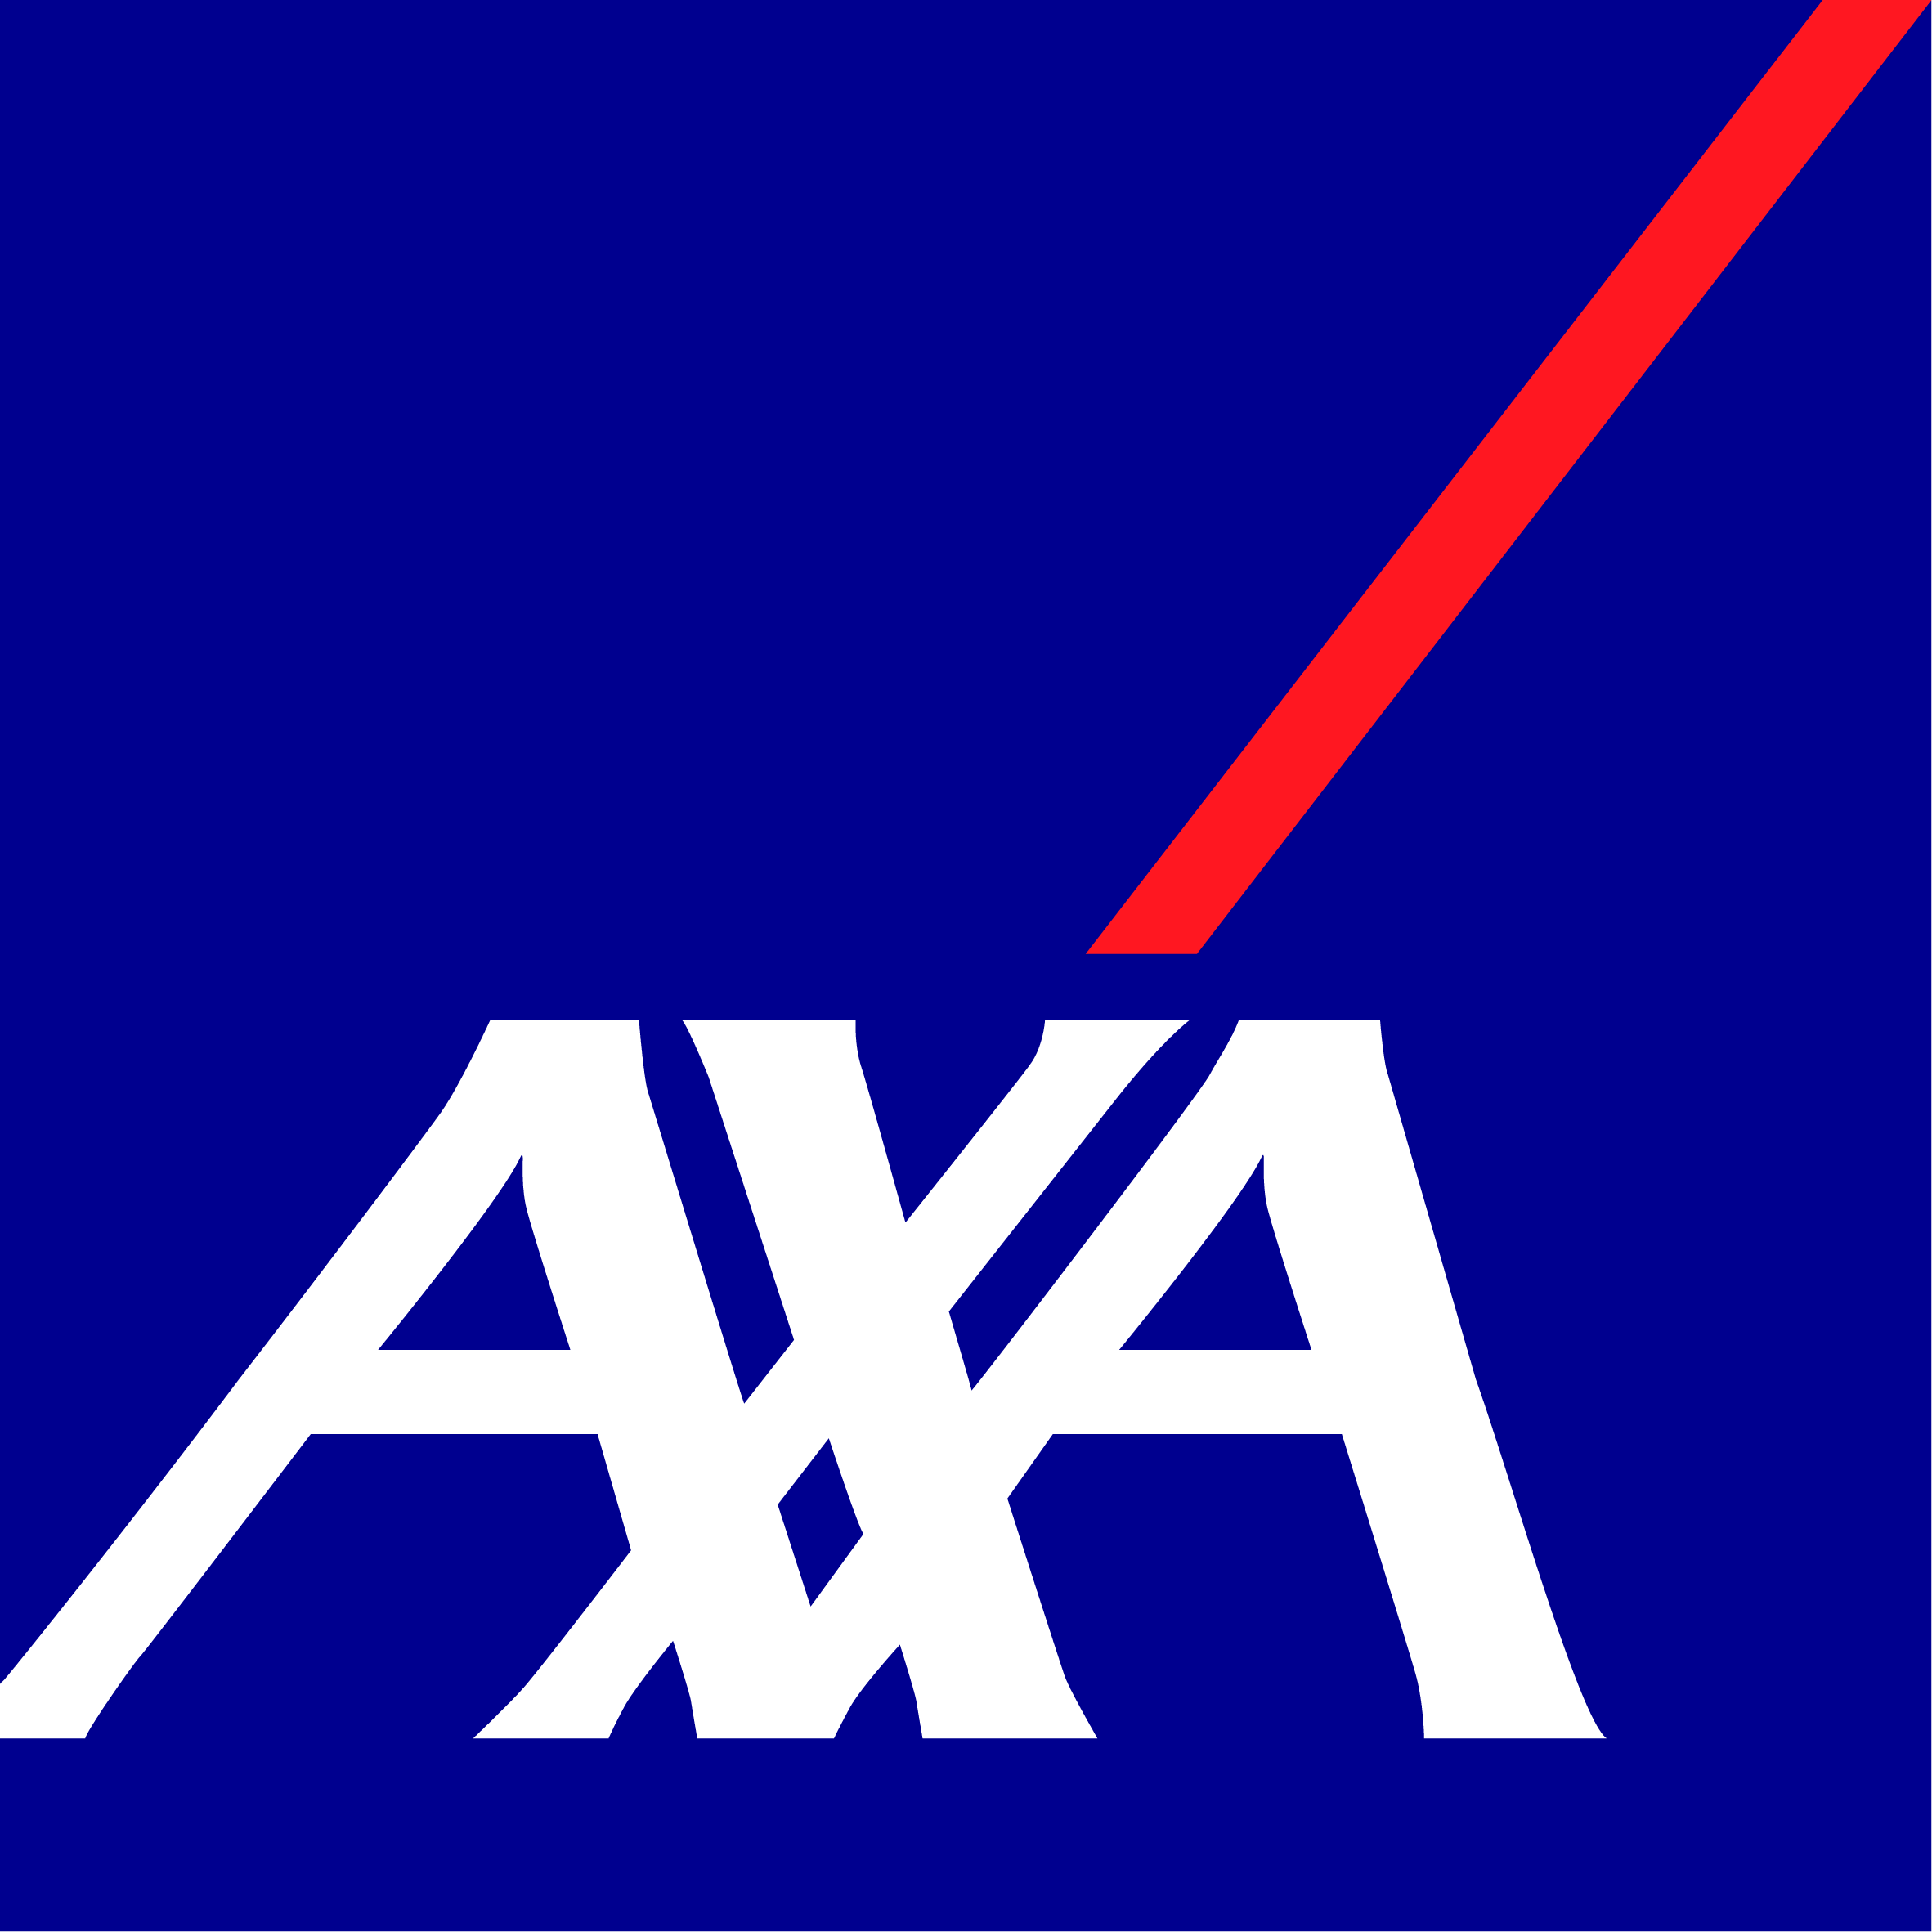 AXA XL.png